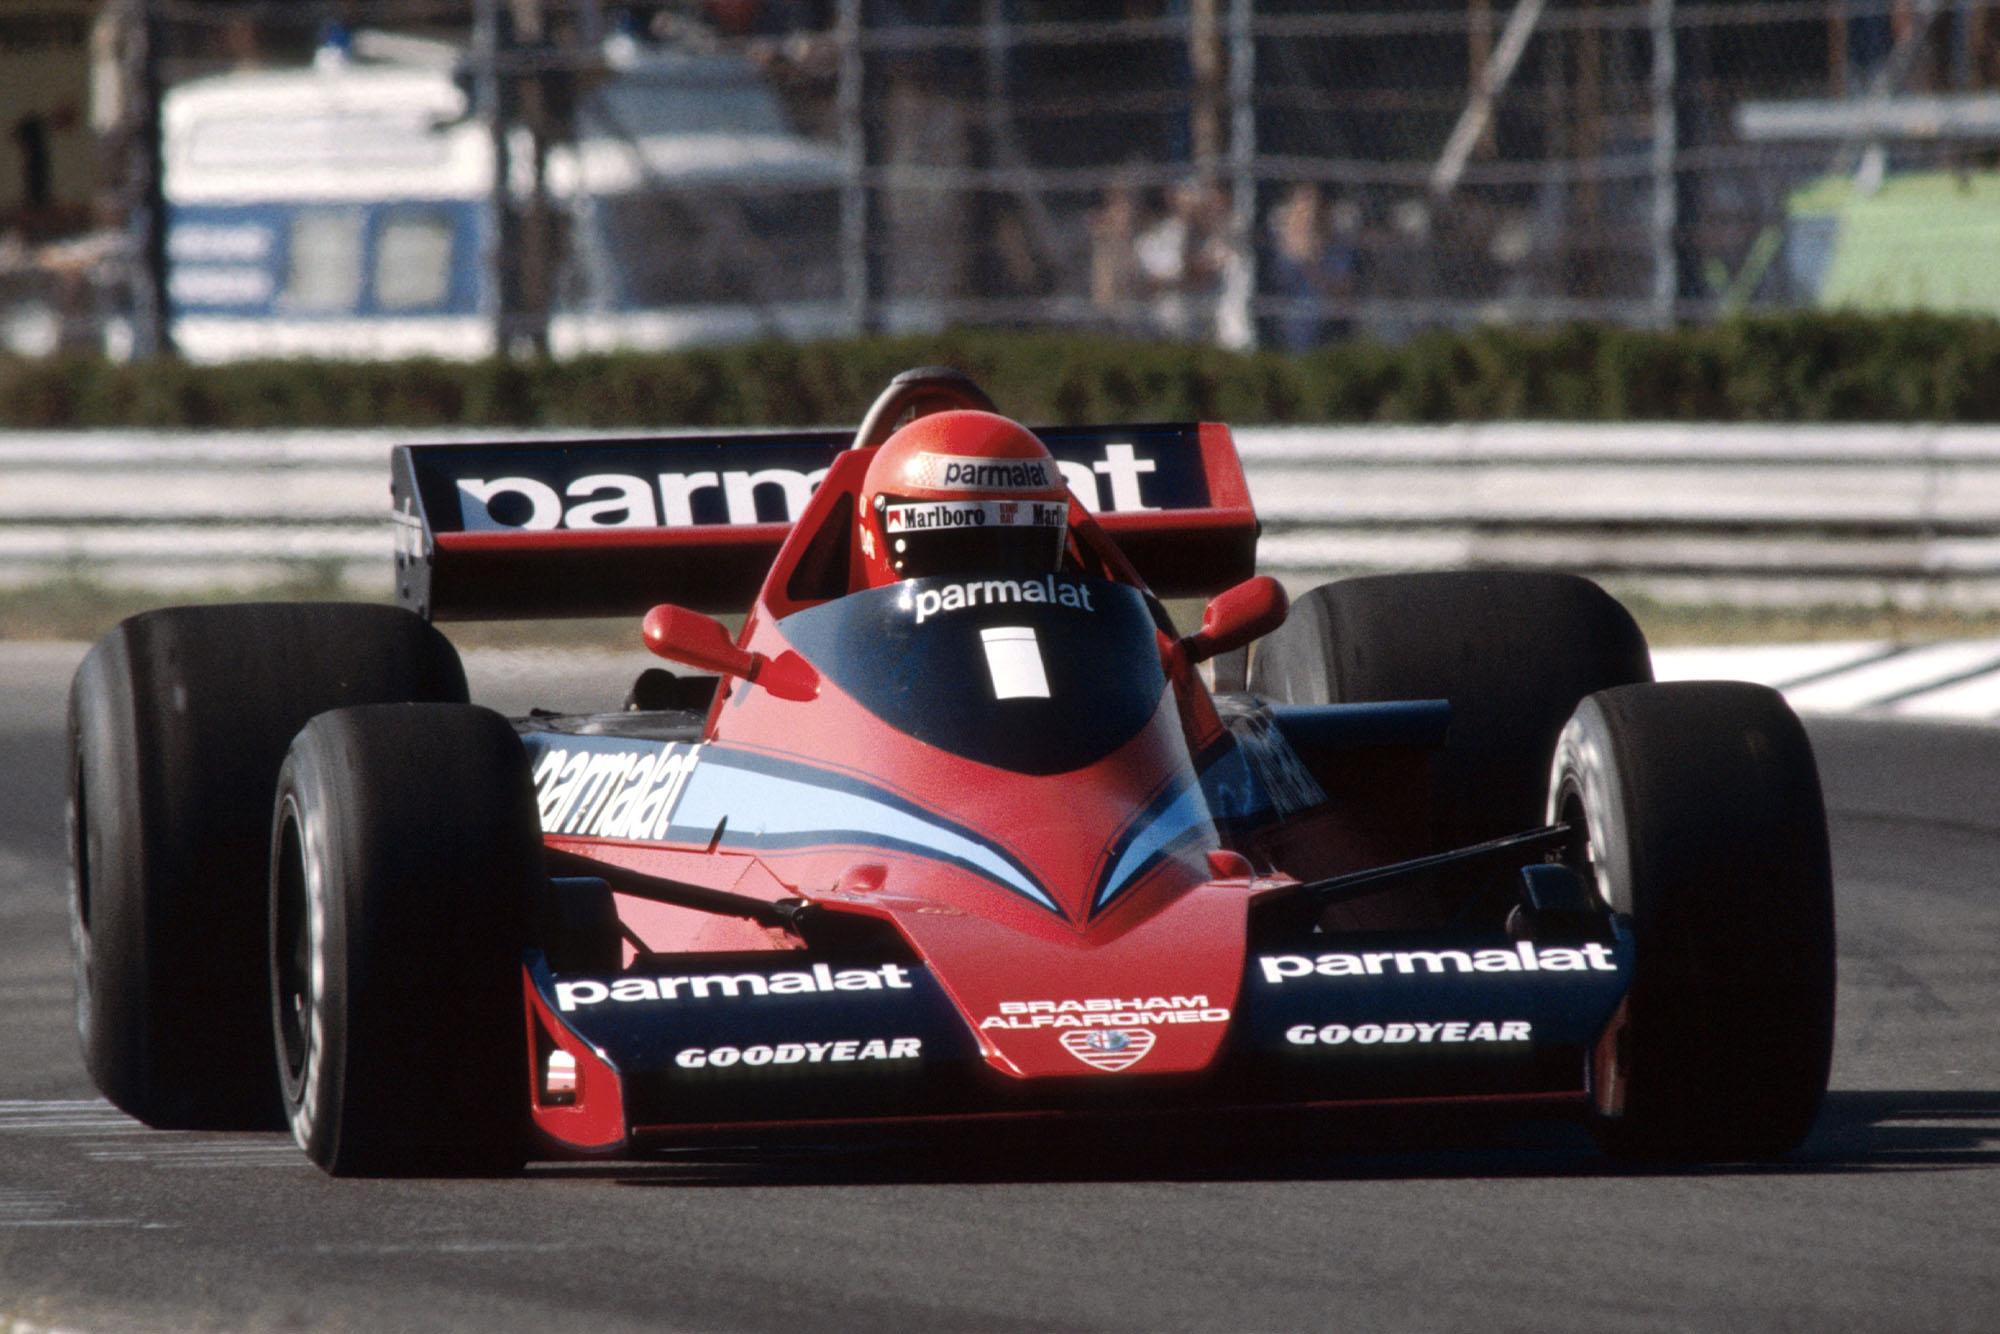 Niki Lauda (Brabham) driving at the 1978 Italian Grand Prix, Monza.